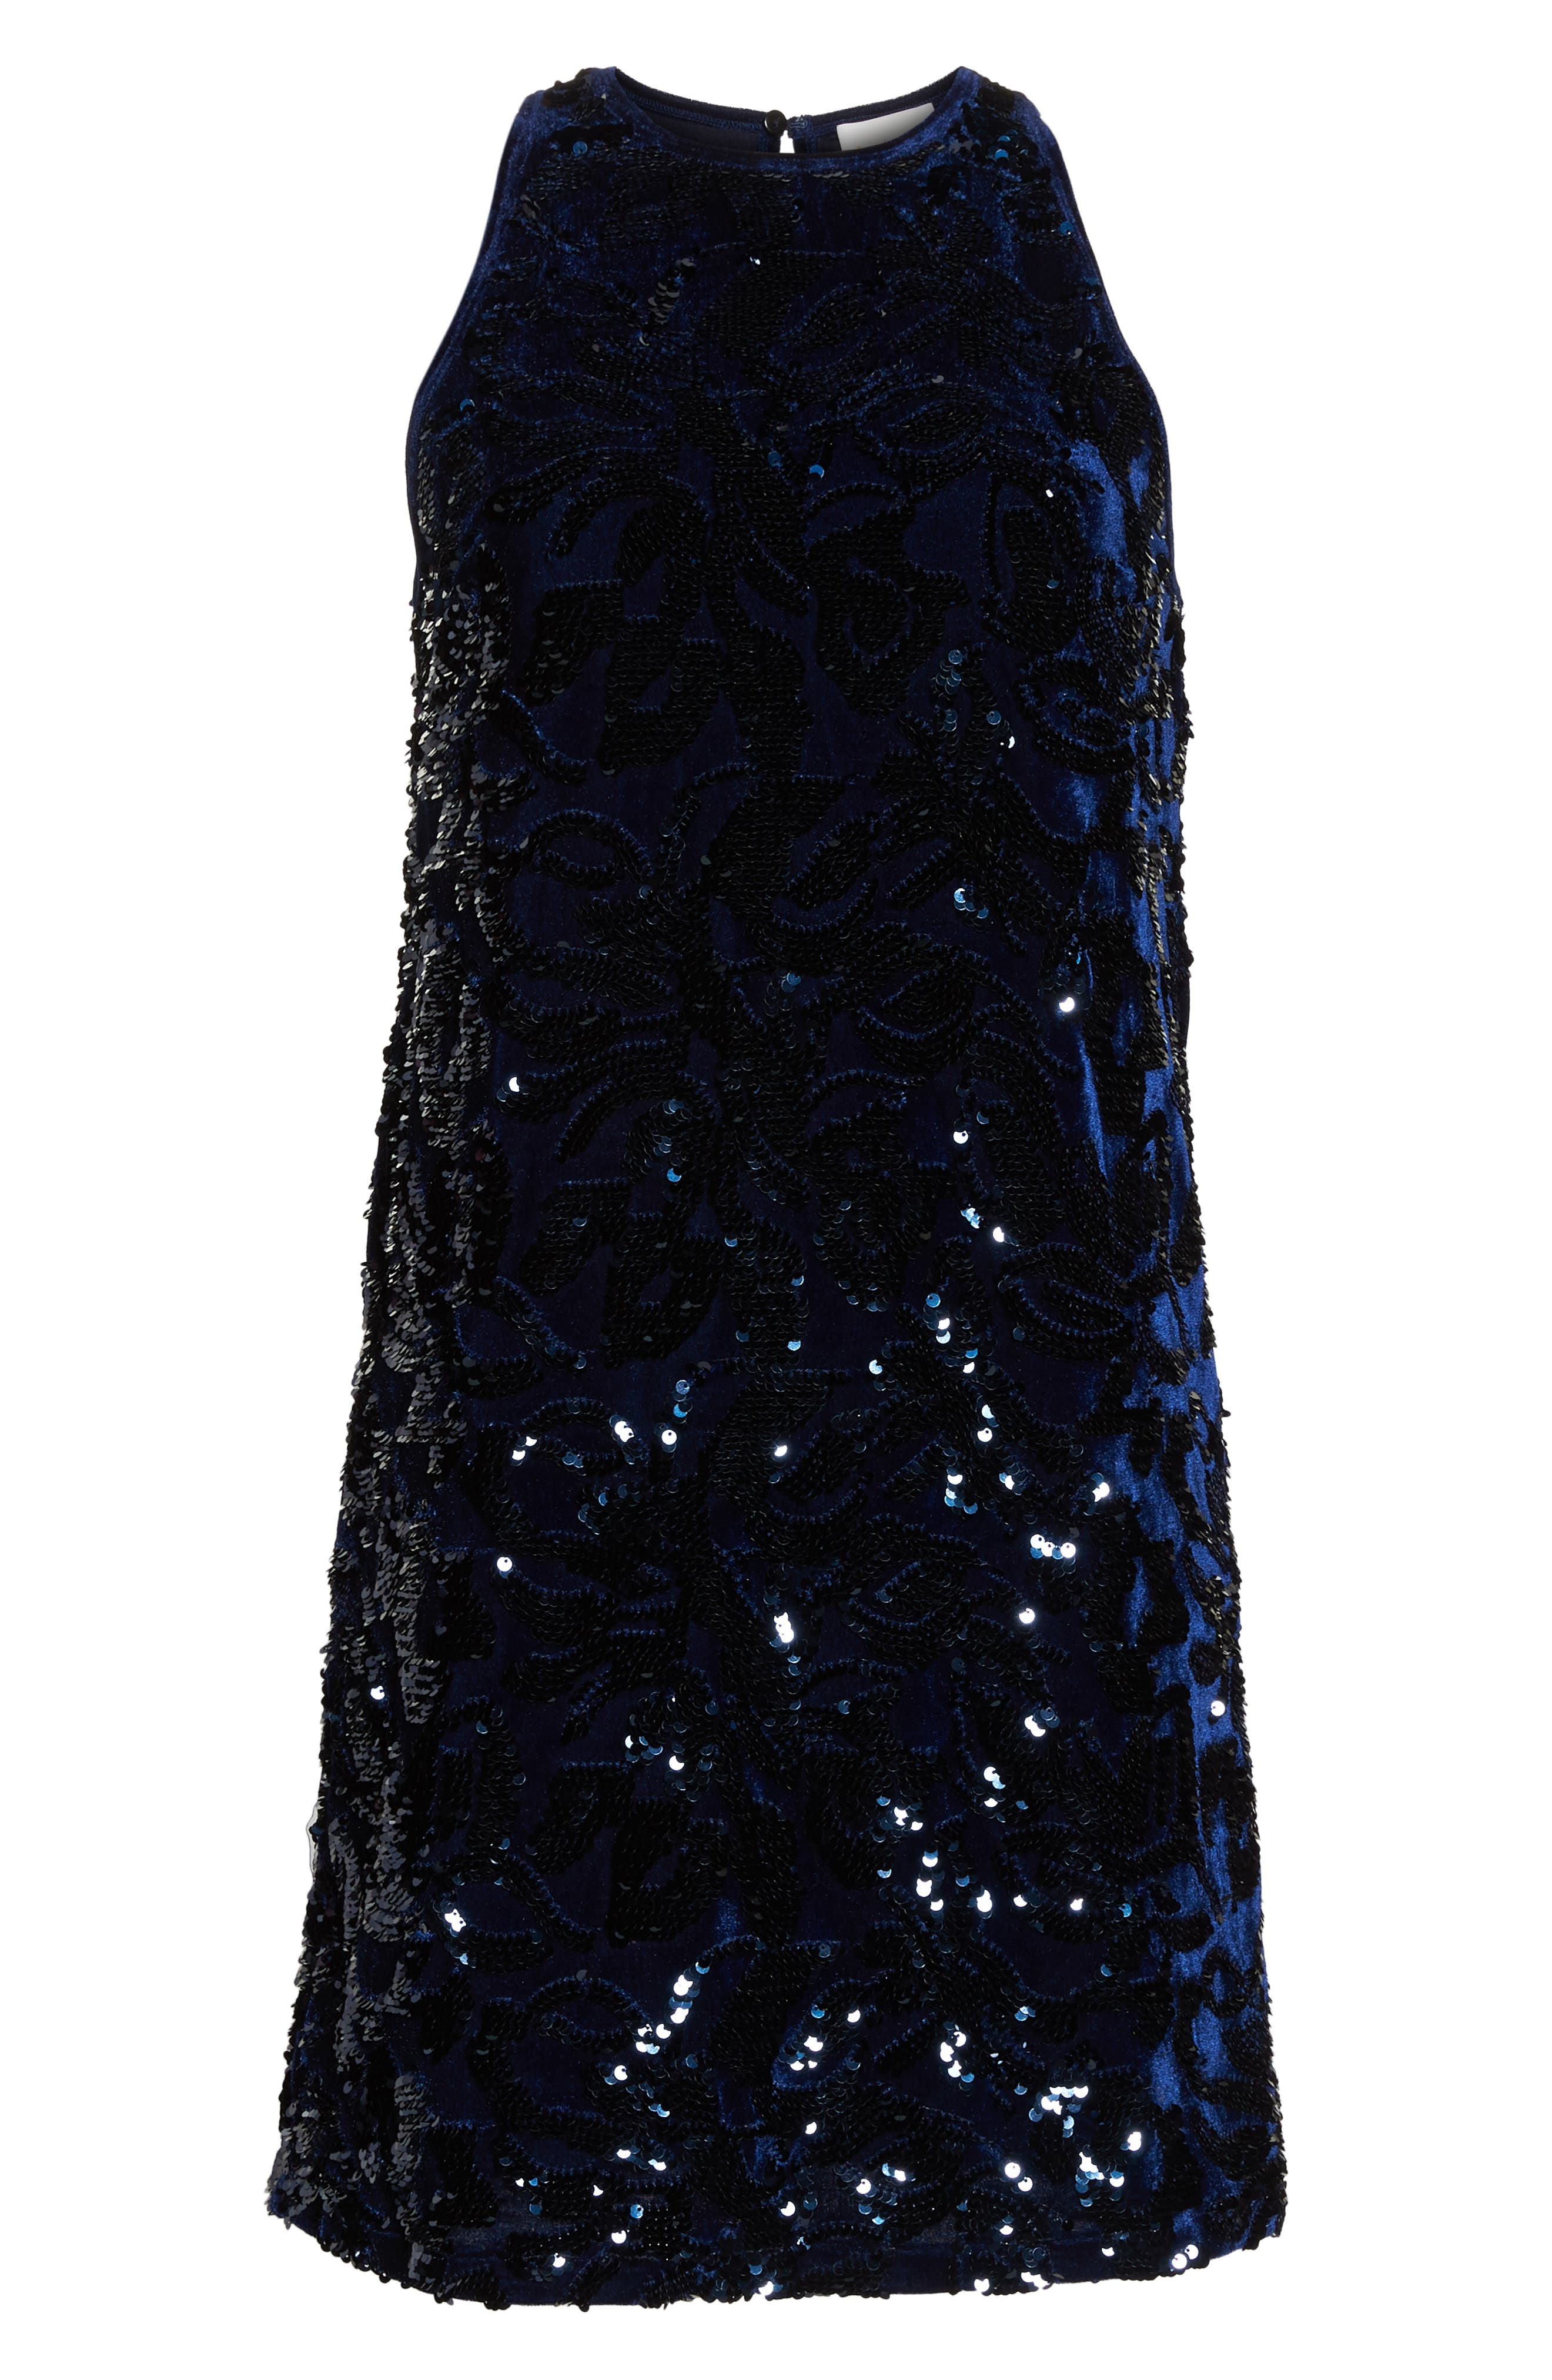 Teddy Sequin Embellished Dress,                             Alternate thumbnail 7, color,                             NAVY MULTI